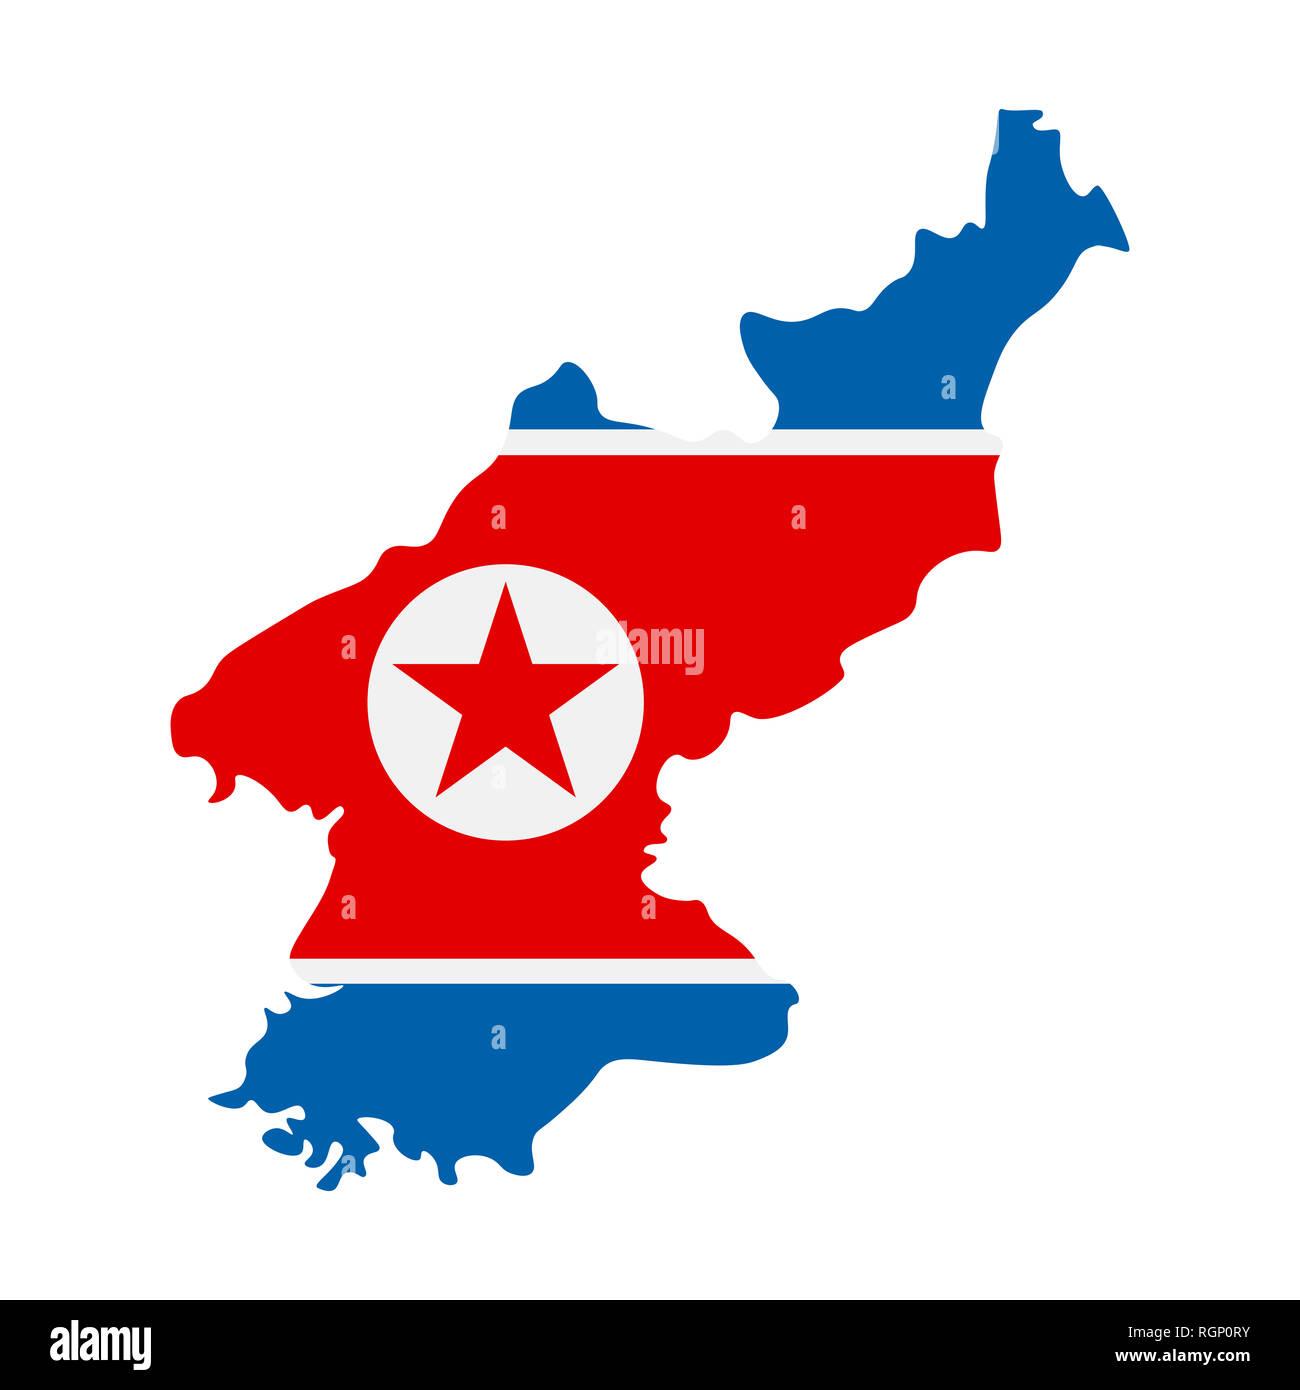 North Korea Outline Stock Photos North Korea Outline Stock Images